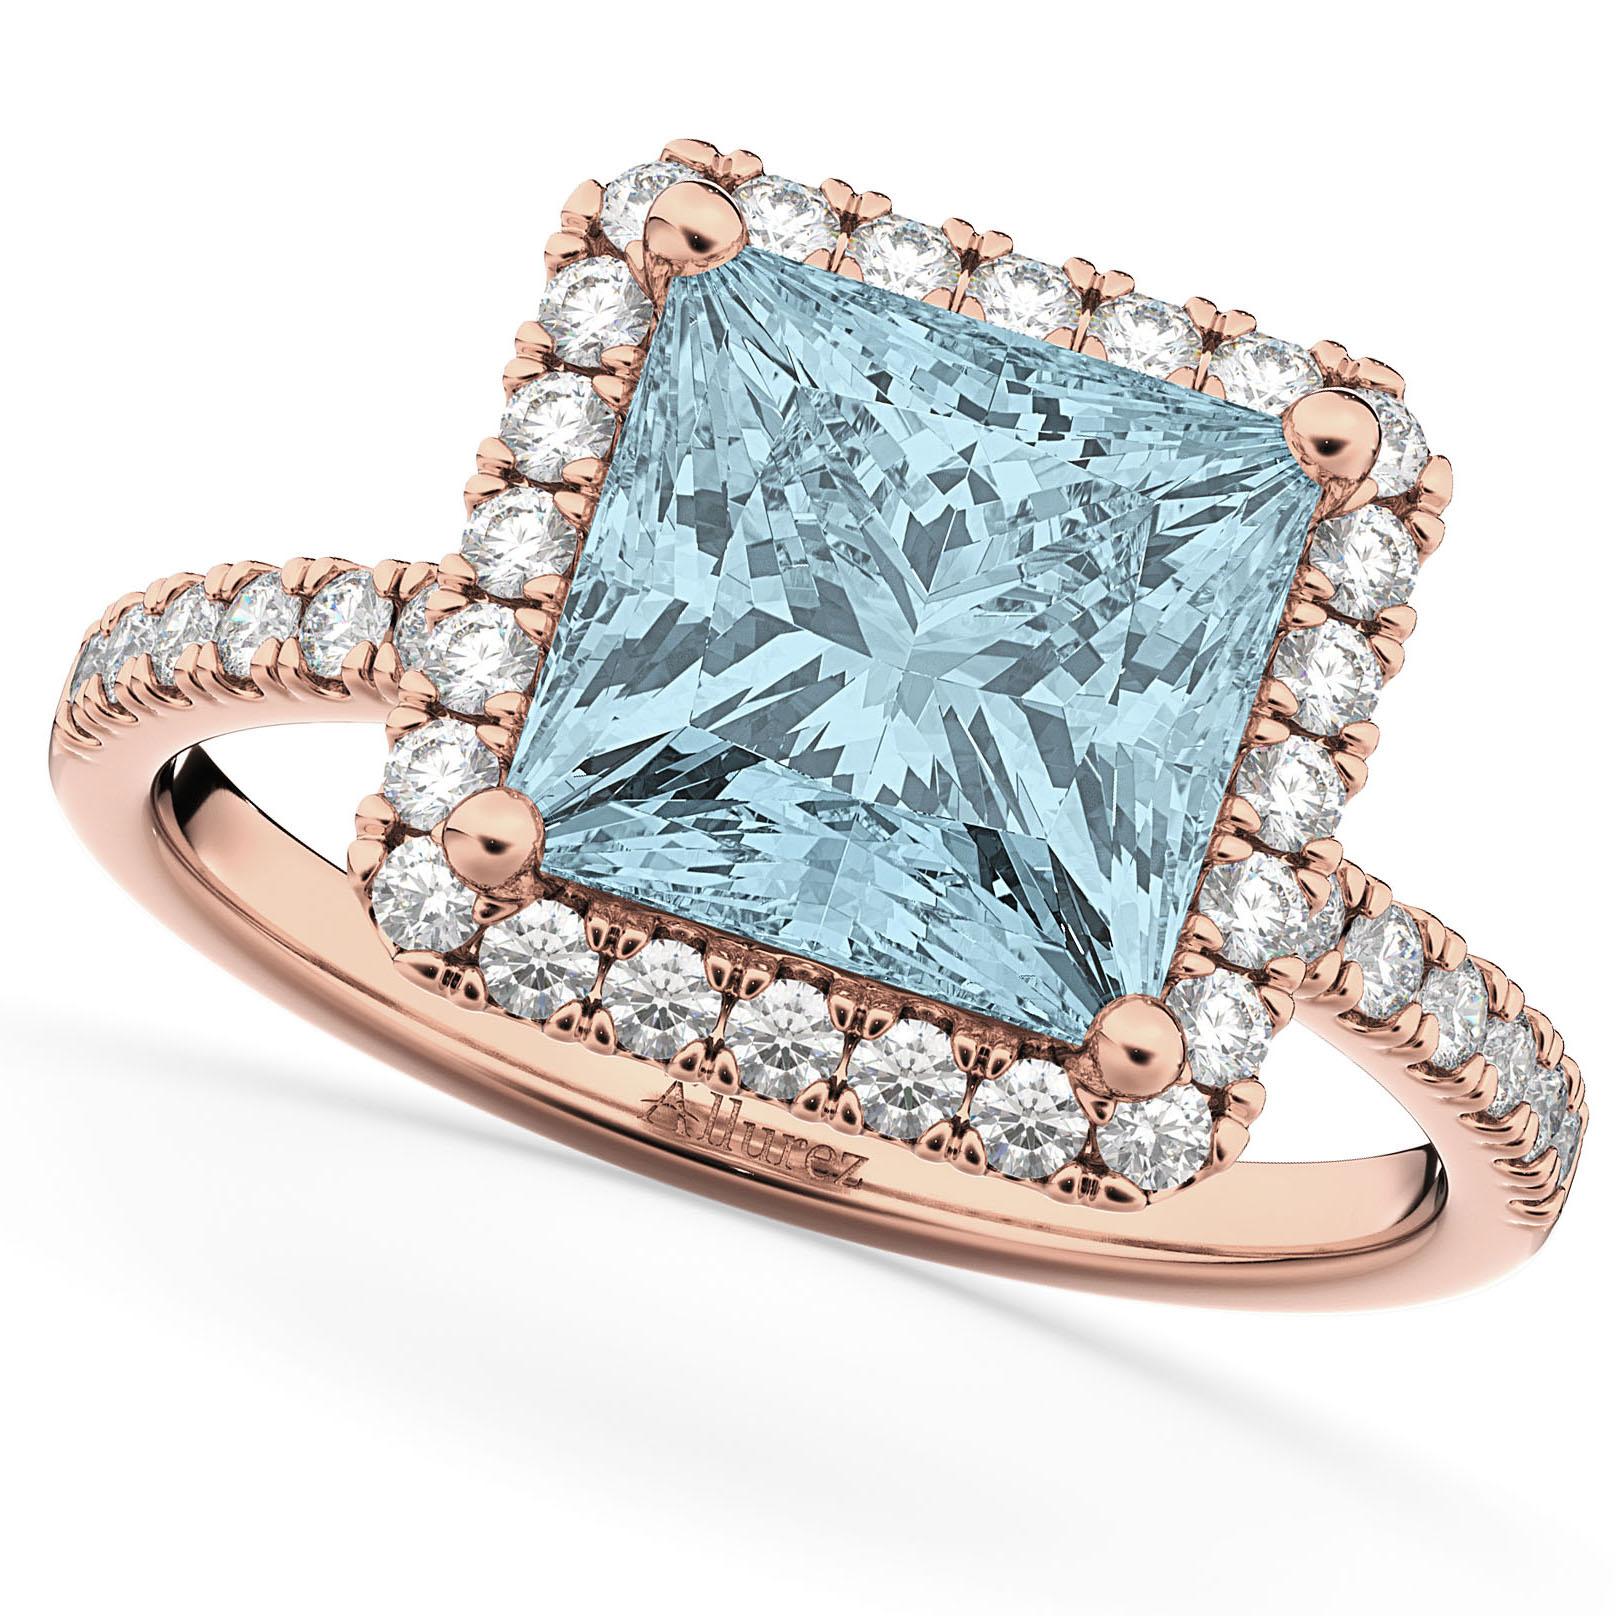 Princess Cut Halo Aquamarine & Diamond Engagement Ring 14K Rose Gold 3.47ct